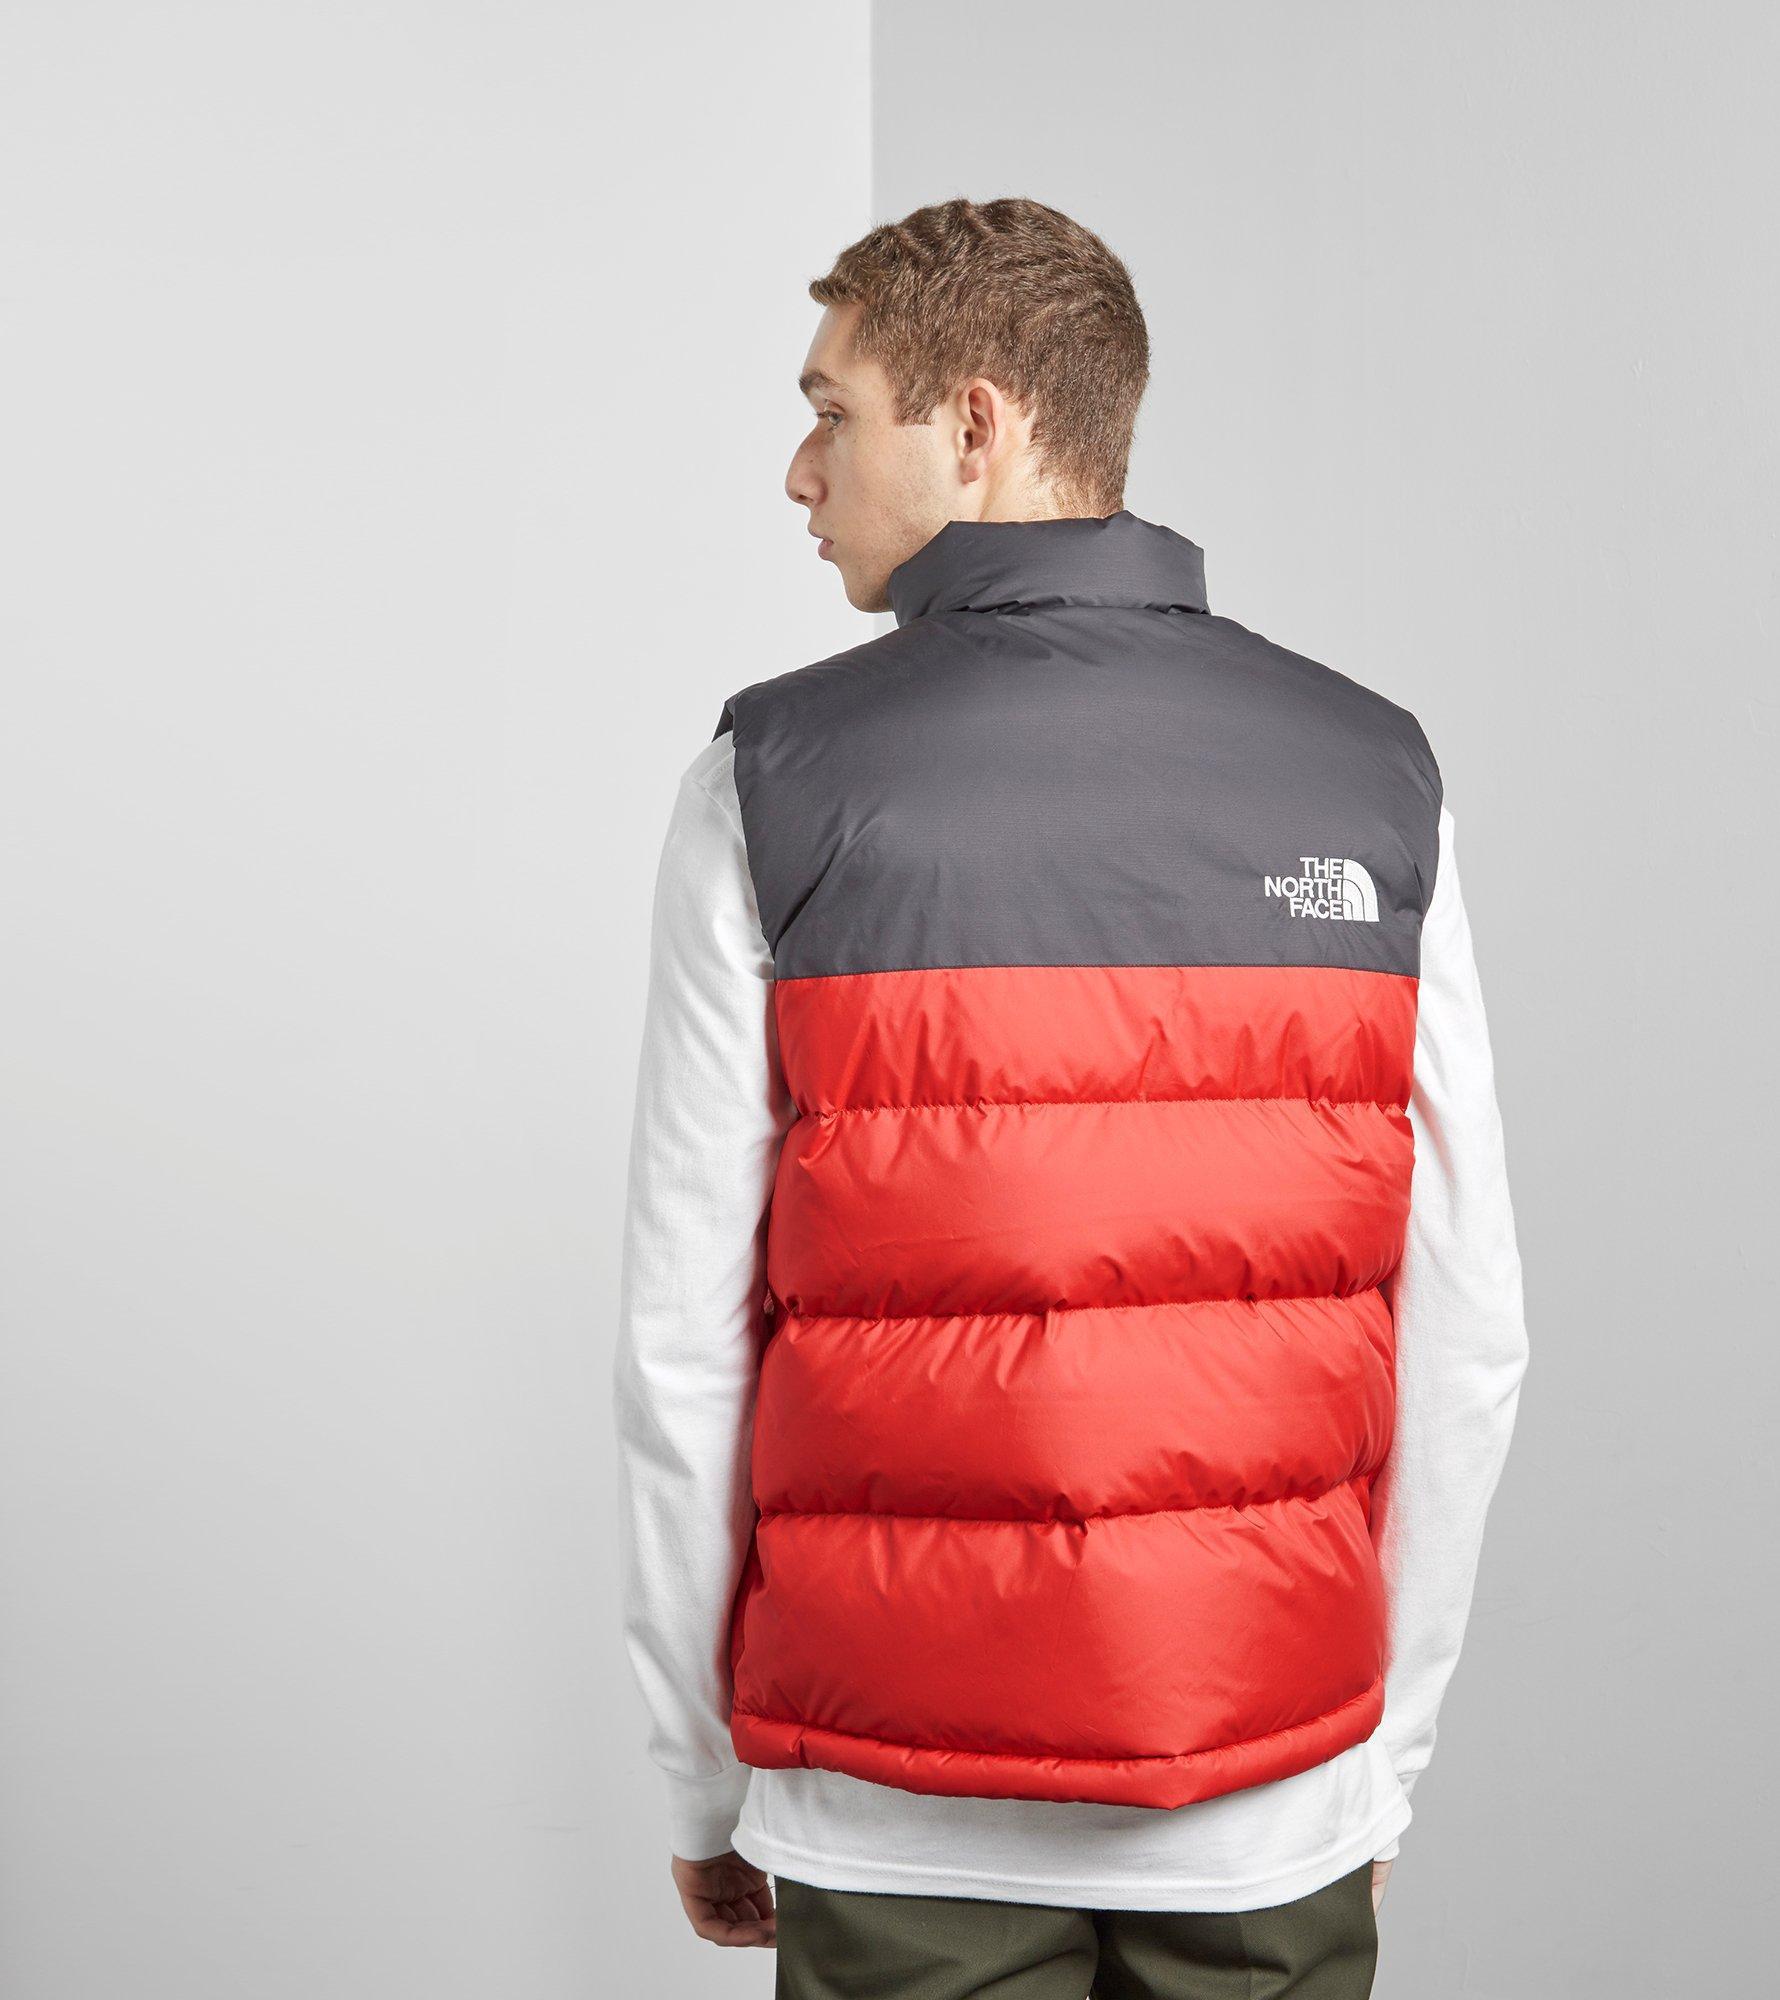 f6eb2c771 canada the north face m 1992 nuptse jacket red black cf1d8 1ea0e